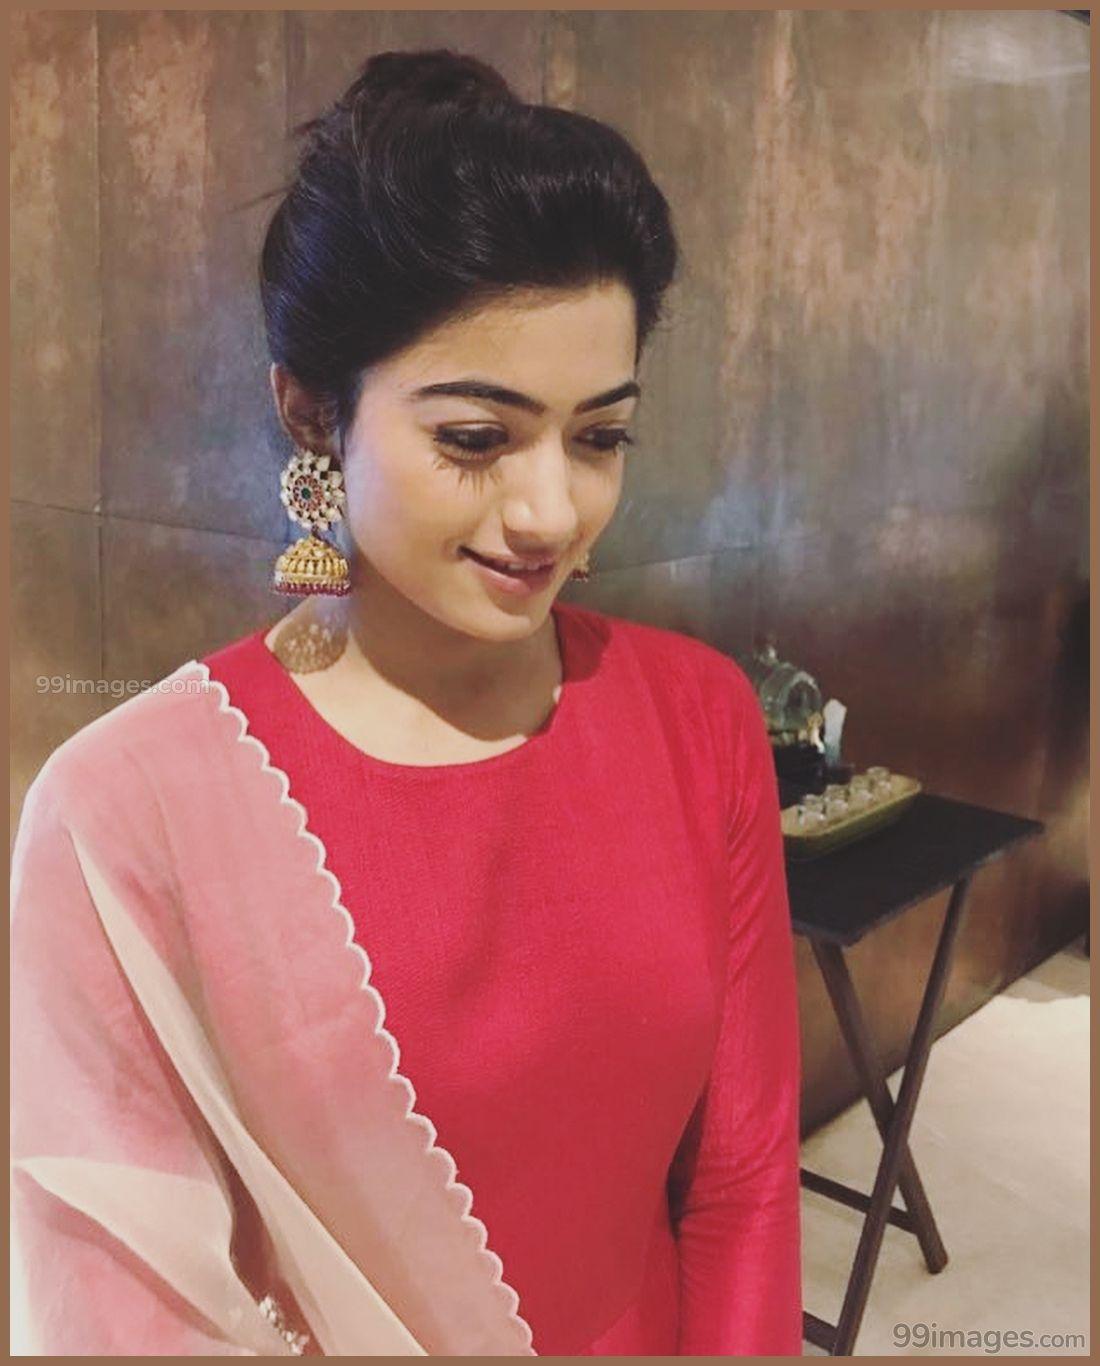 Rashmika Mandanna Beautiful Hd Photos Mobile Wallpapers Hd Android Iphone 1080p Stylish Girls Photos Stylish Girl Images Most Beautiful Indian Actress